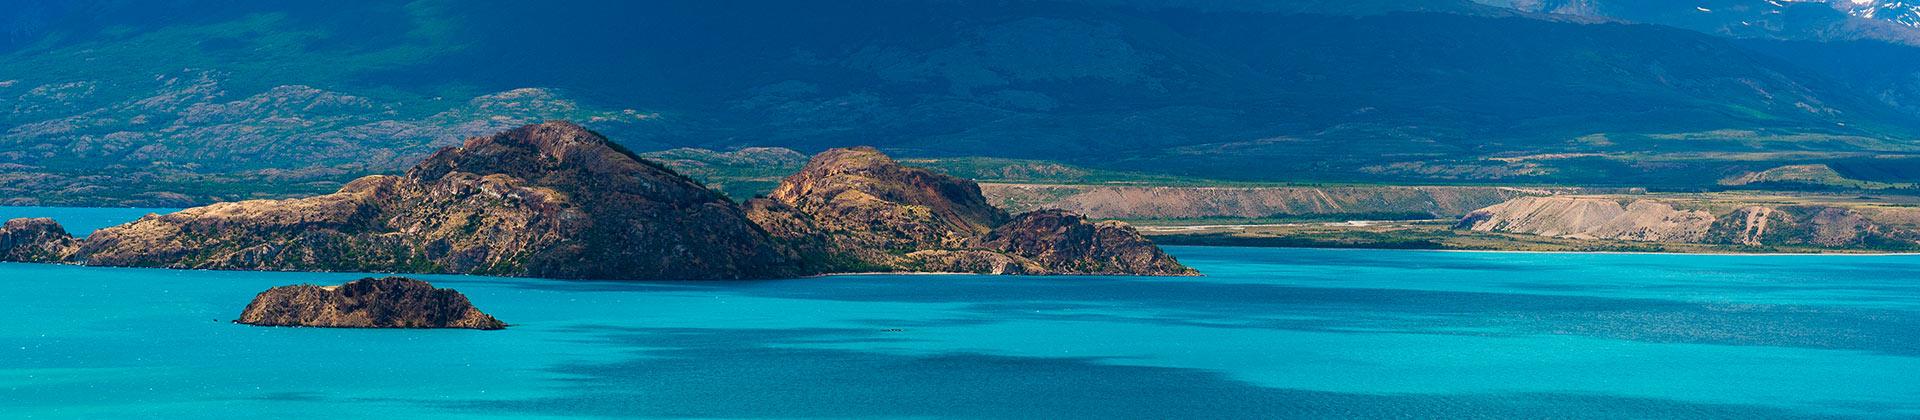 Landschap Patagonië